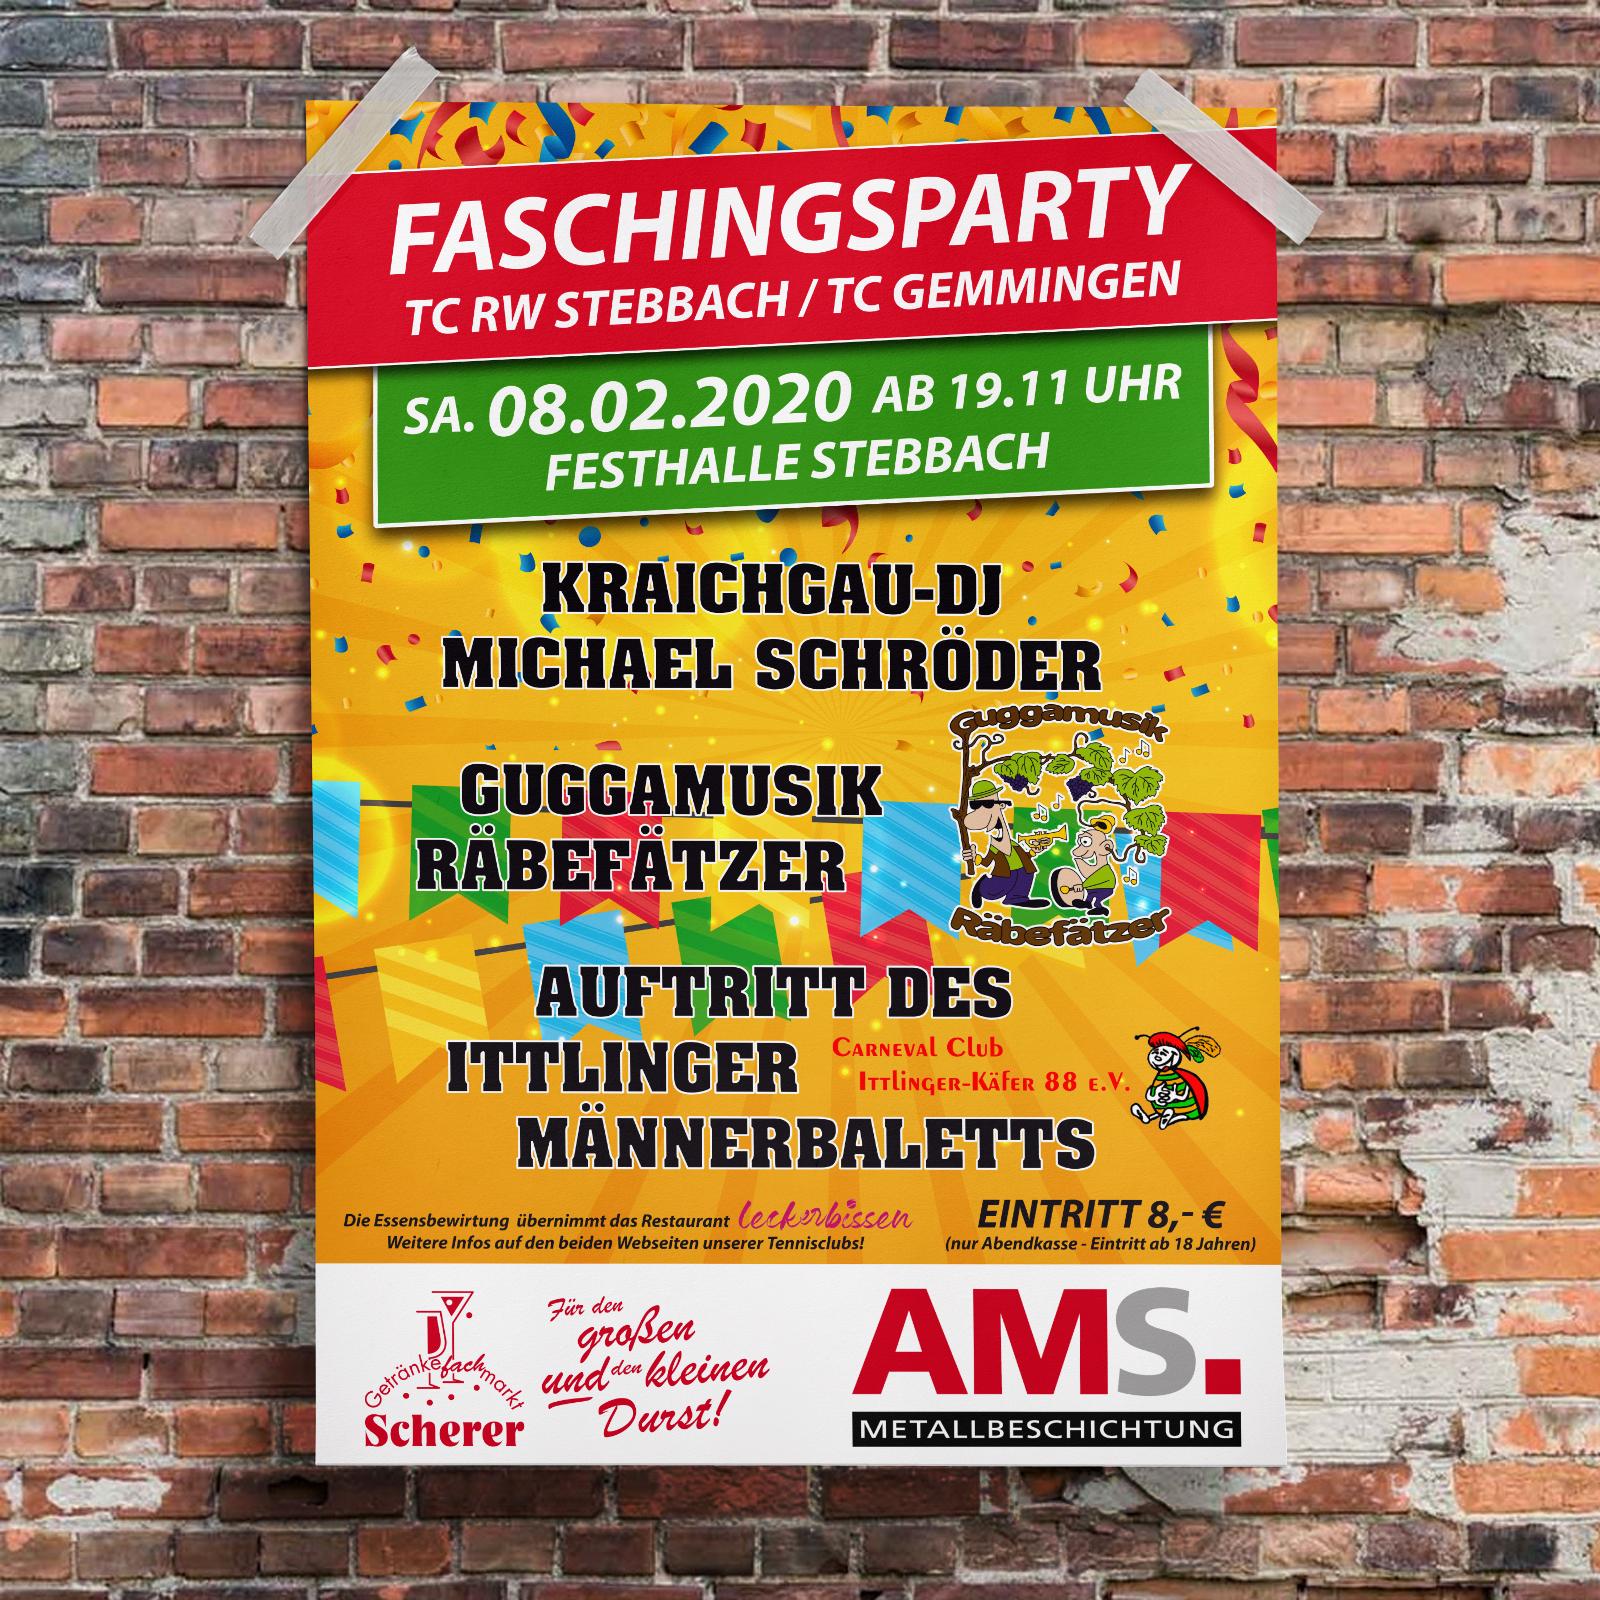 Fasching_Gemmingen-Stebbach.jpg